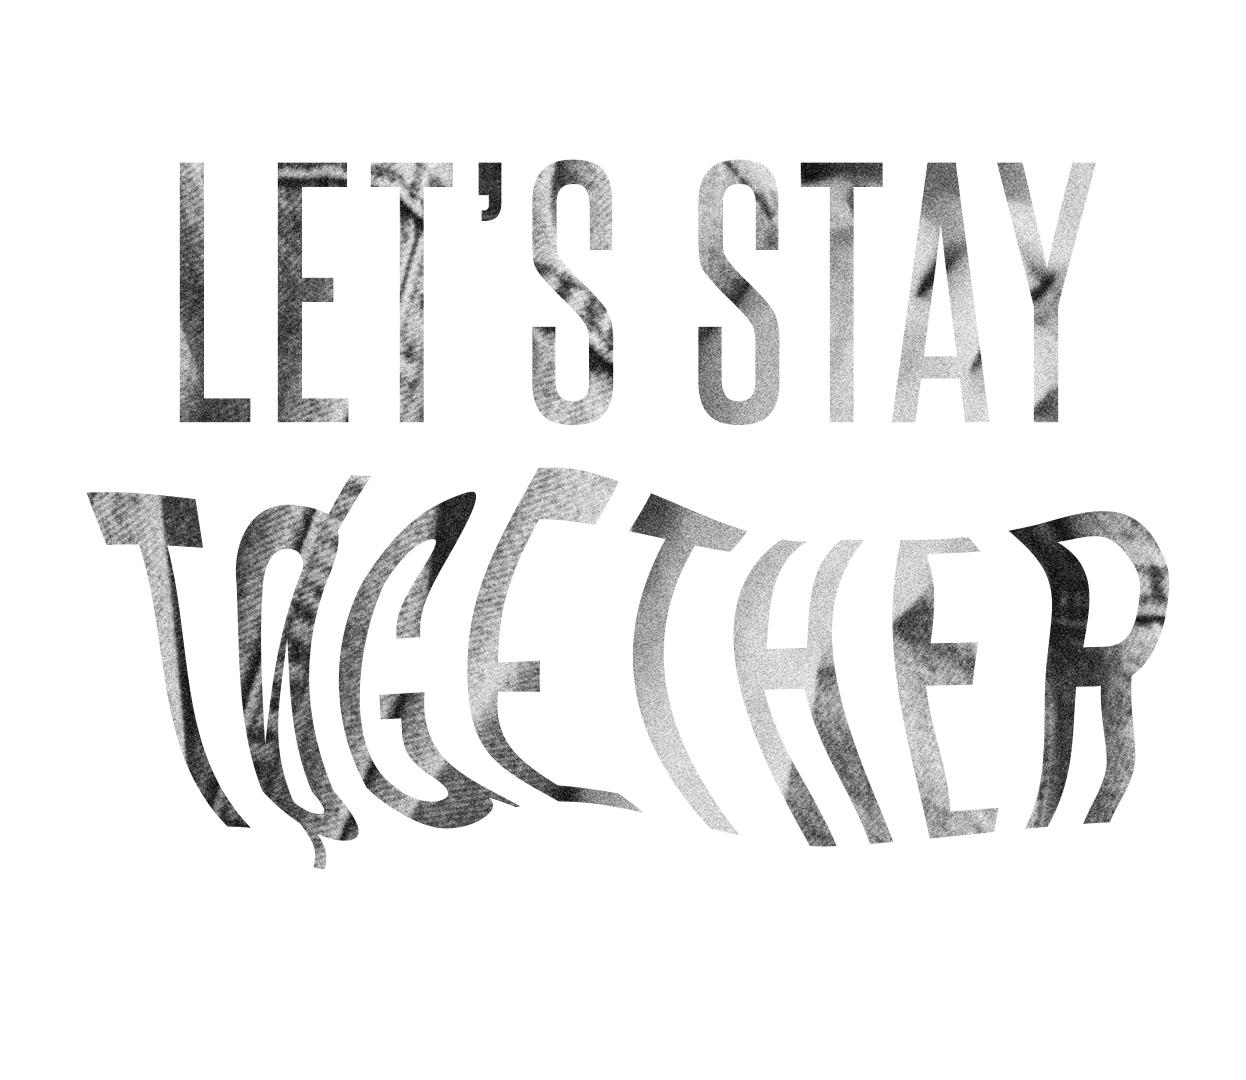 Lets stay.jpg